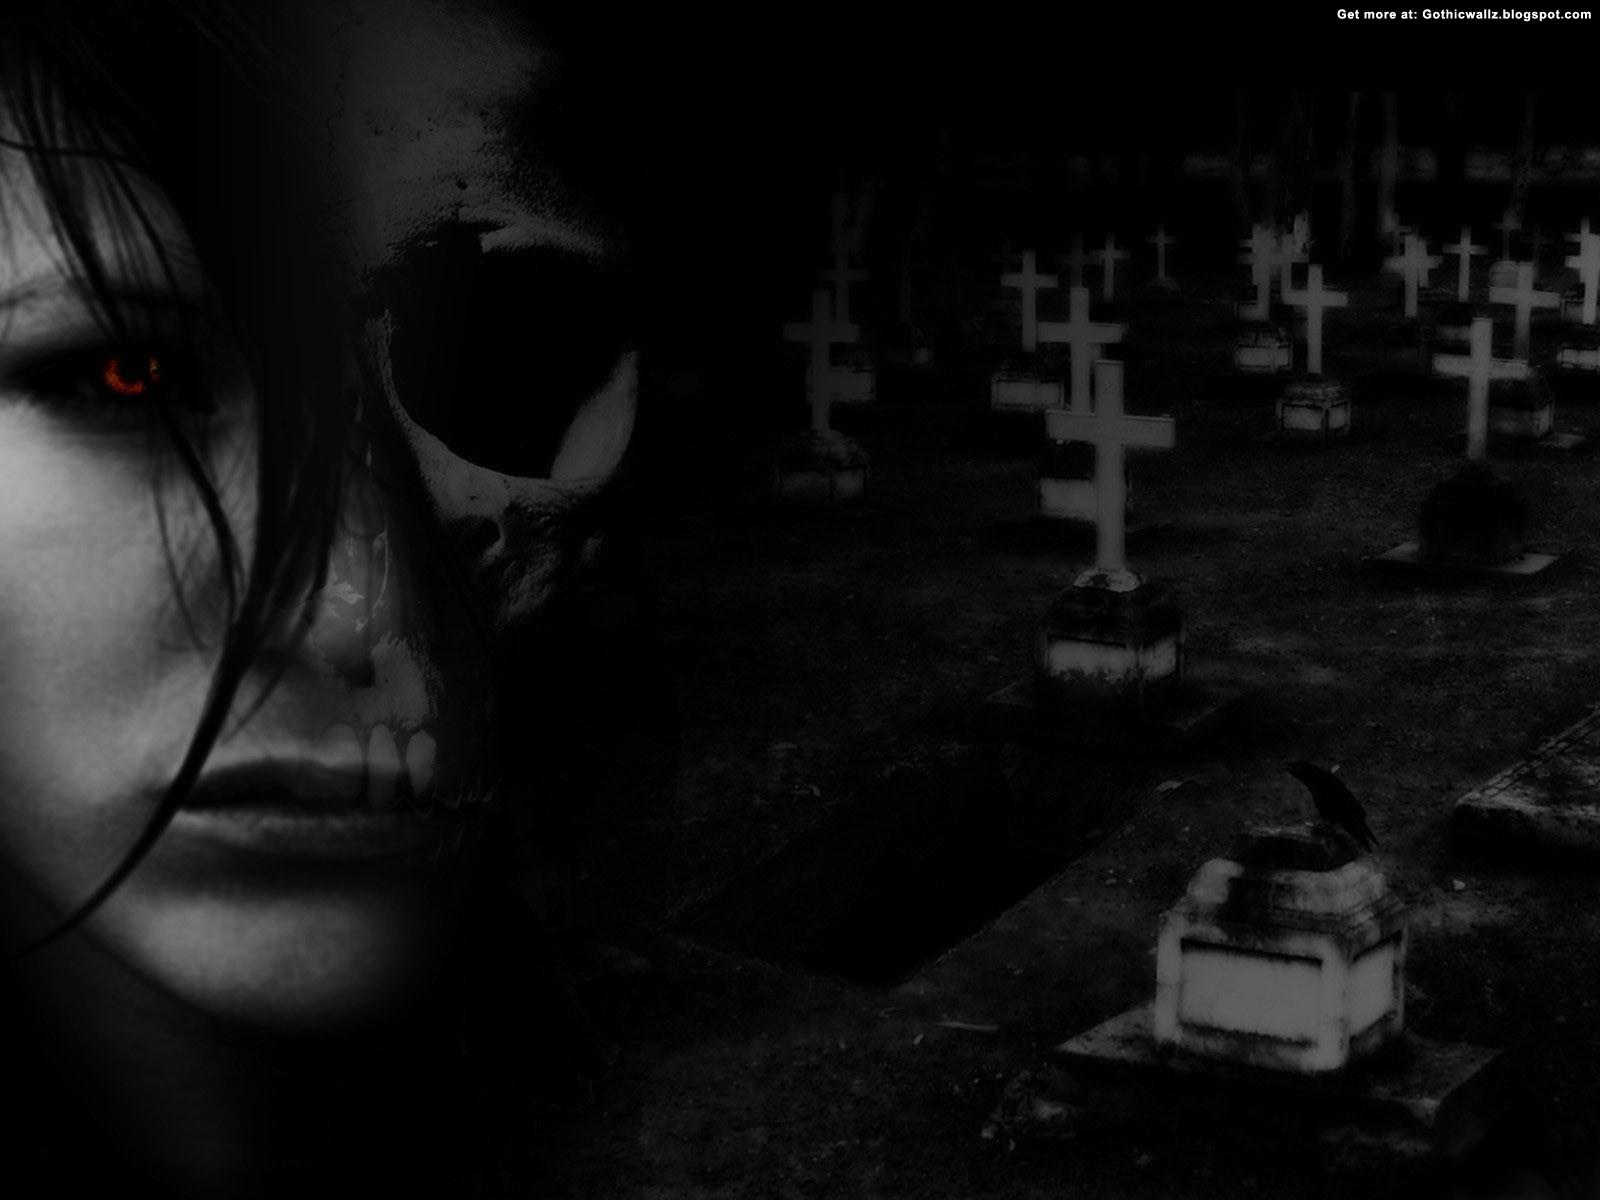 poze horror | Gothic Wallpaper Download